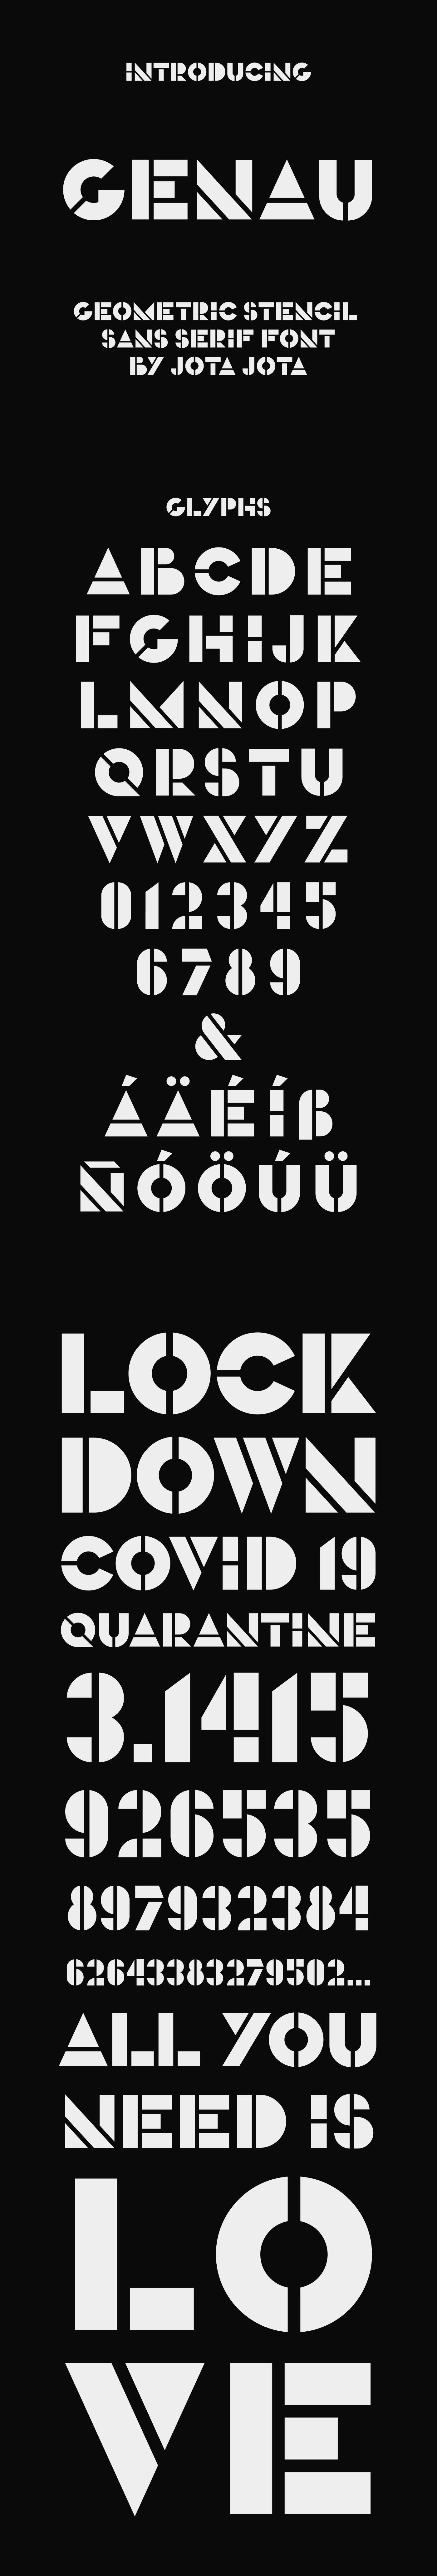 bold Display font free freebie geometric sans serif type Typeface